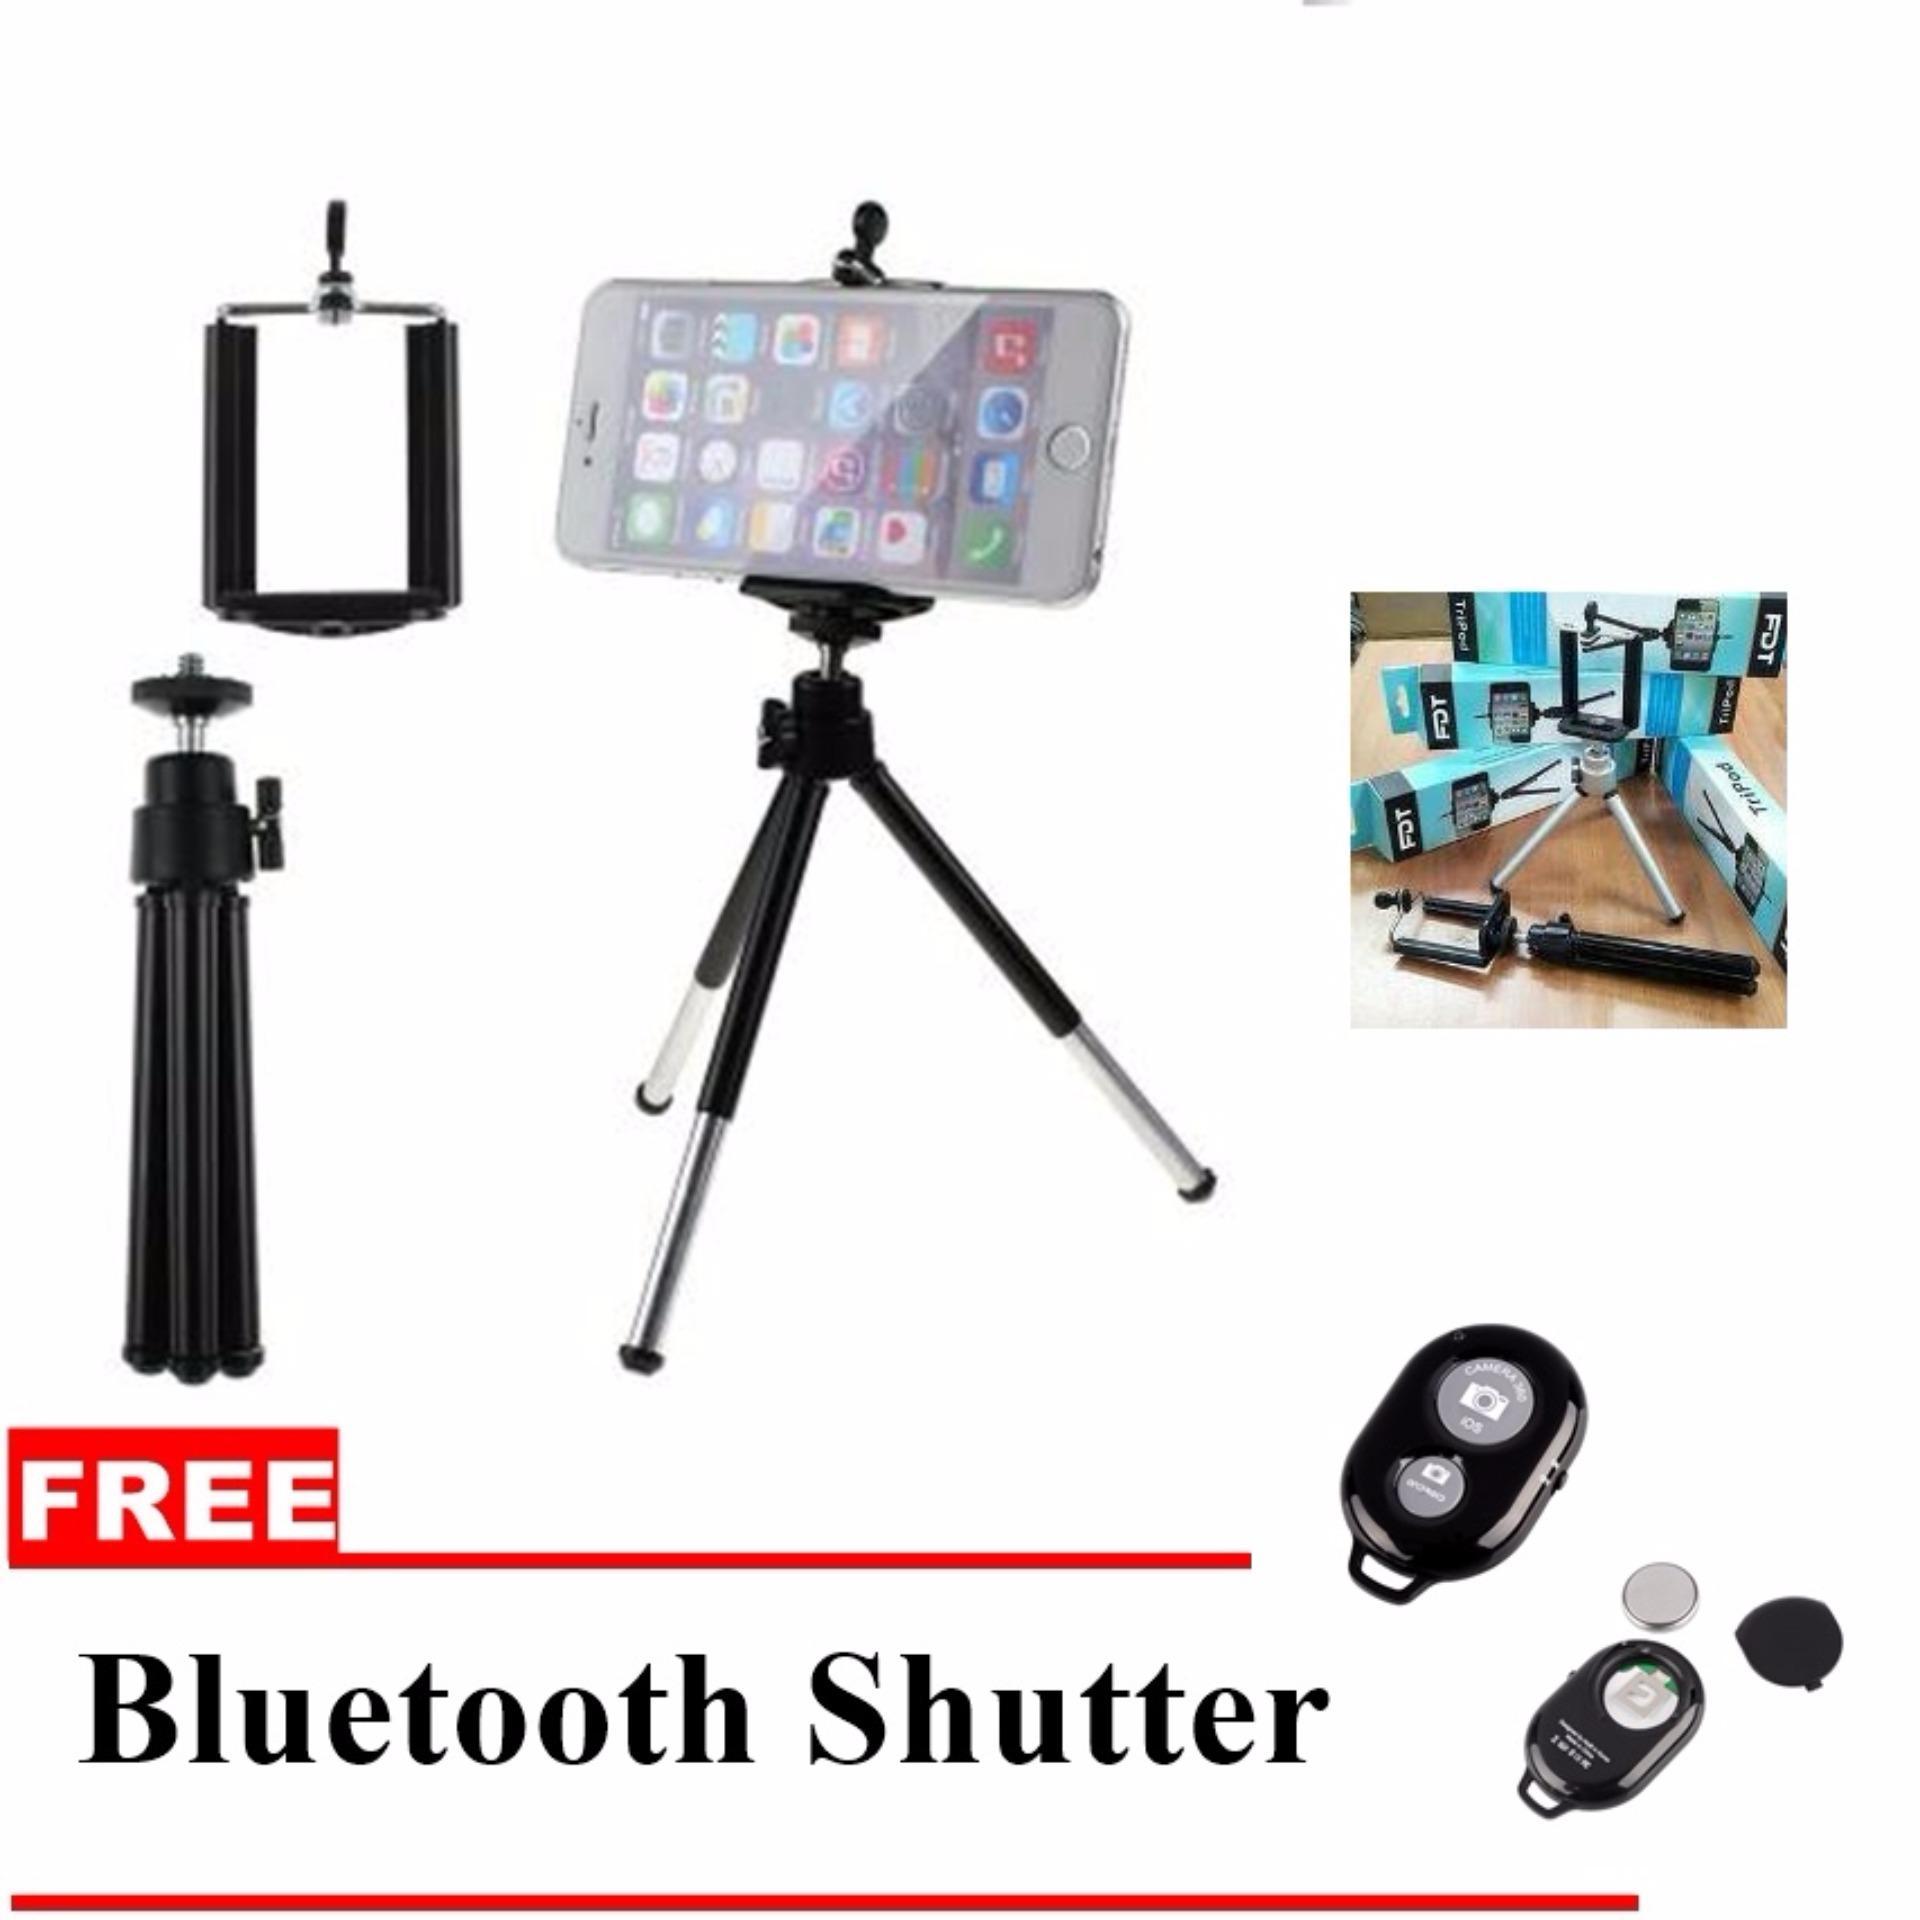 1shop Flexibel Tripod Gorillapod U Holder Free Pouch Multifungsi Tokocamzone Spider Mini Flexible With For Smartphones Fdt Bluetooth Shutter